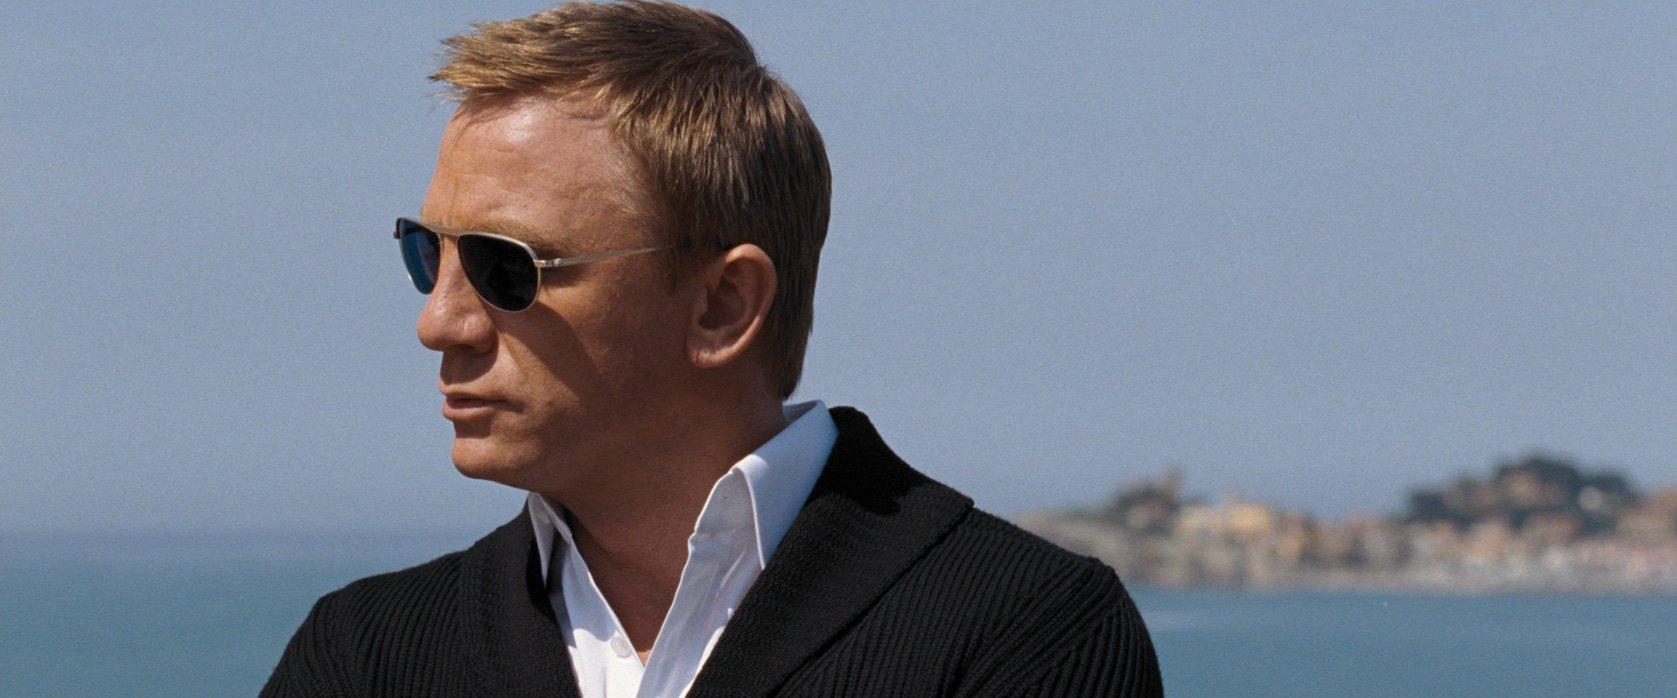 The Shawl Collar Cardigan In Quantum Of Solace Bond Suits